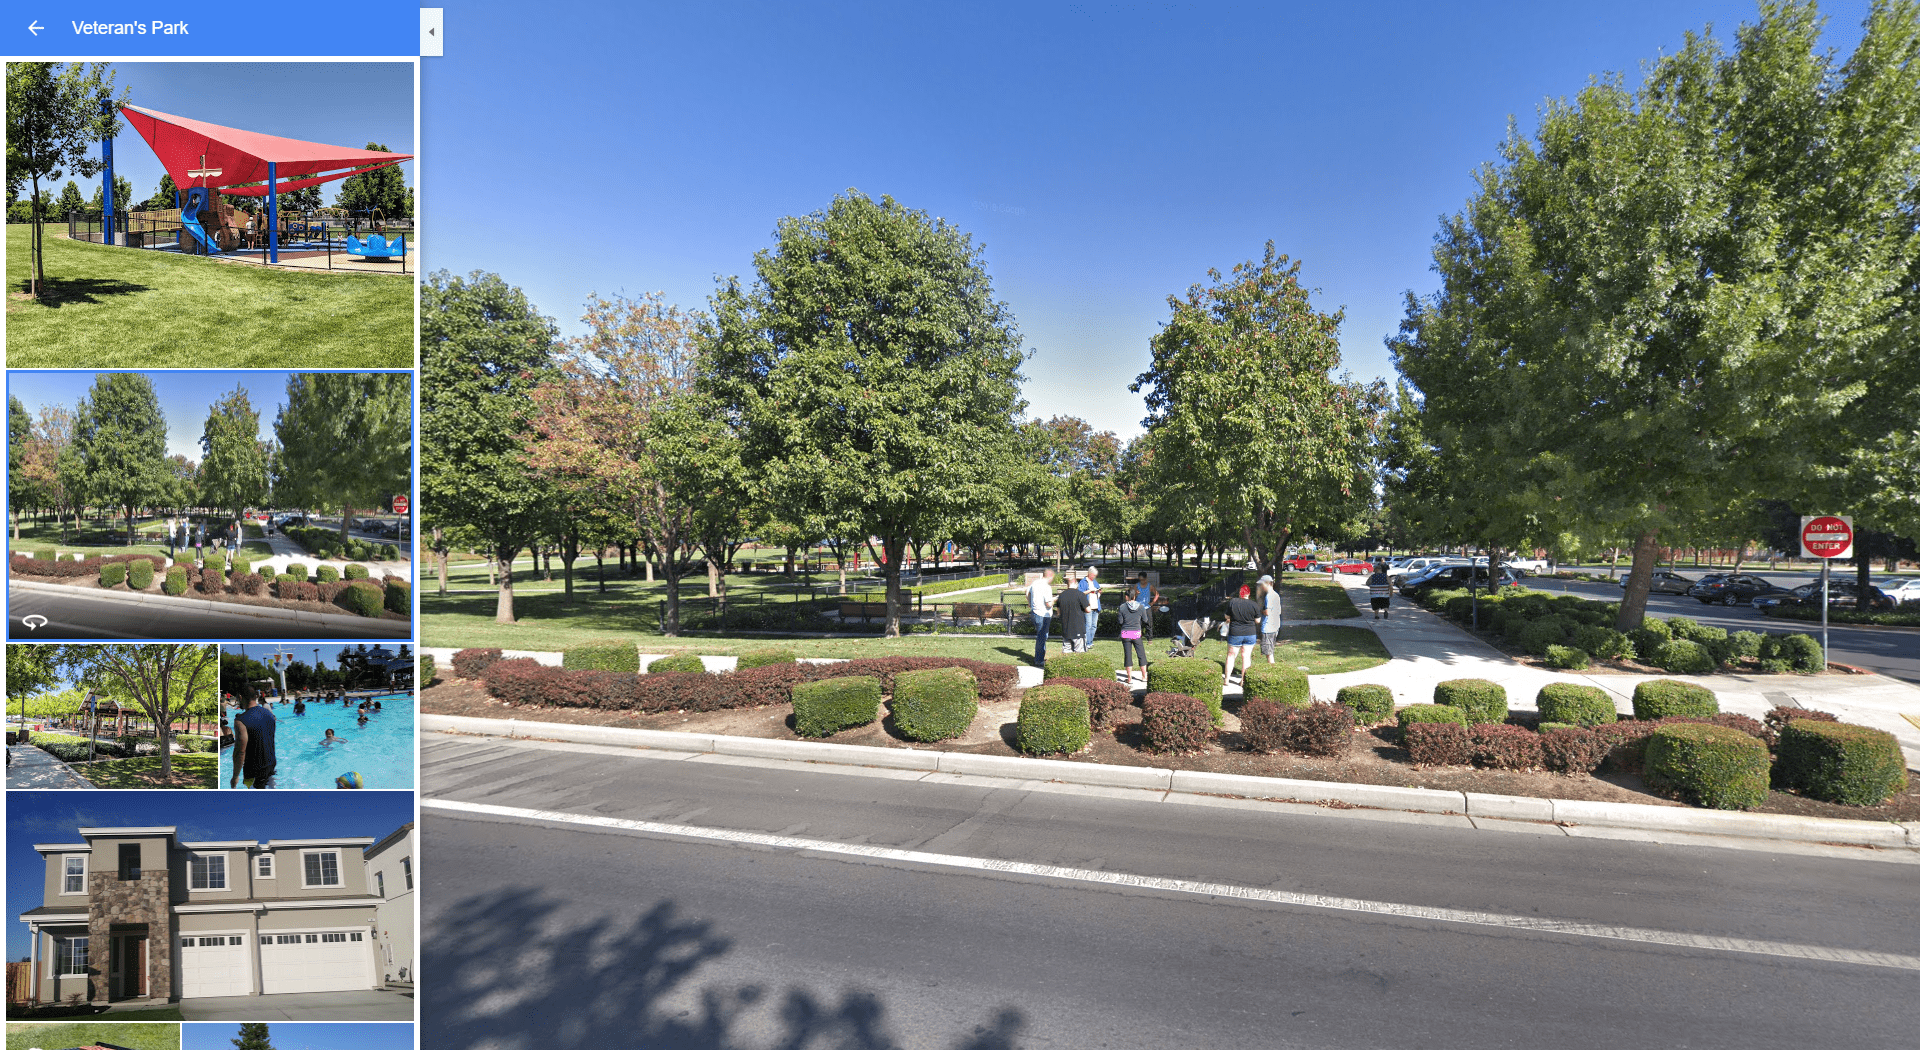 Veteran's Park - Brentwood CA